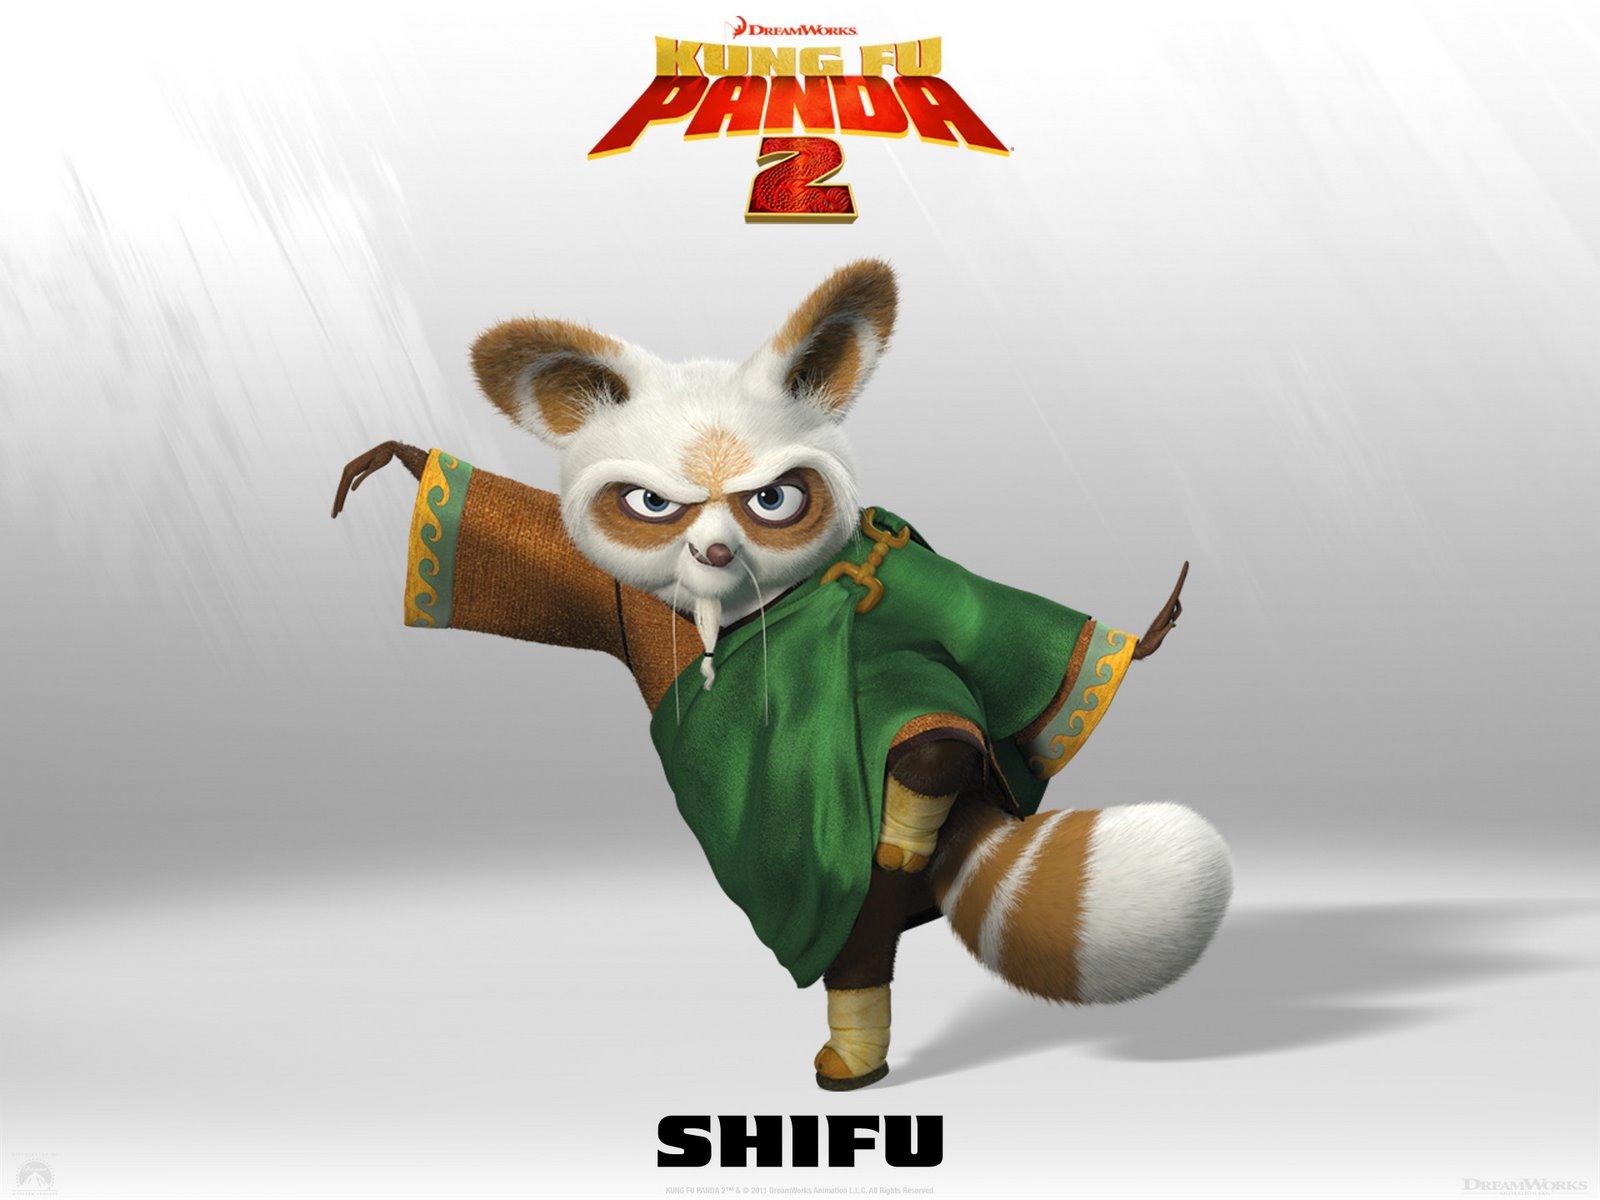 http://3.bp.blogspot.com/-bJlKRQQ3r98/TcpuH9bj60I/AAAAAAAAANA/wp25EZS-ILM/s1600/Kung-Fu-Panda-2-movies-desktop-wallpaper.jpg